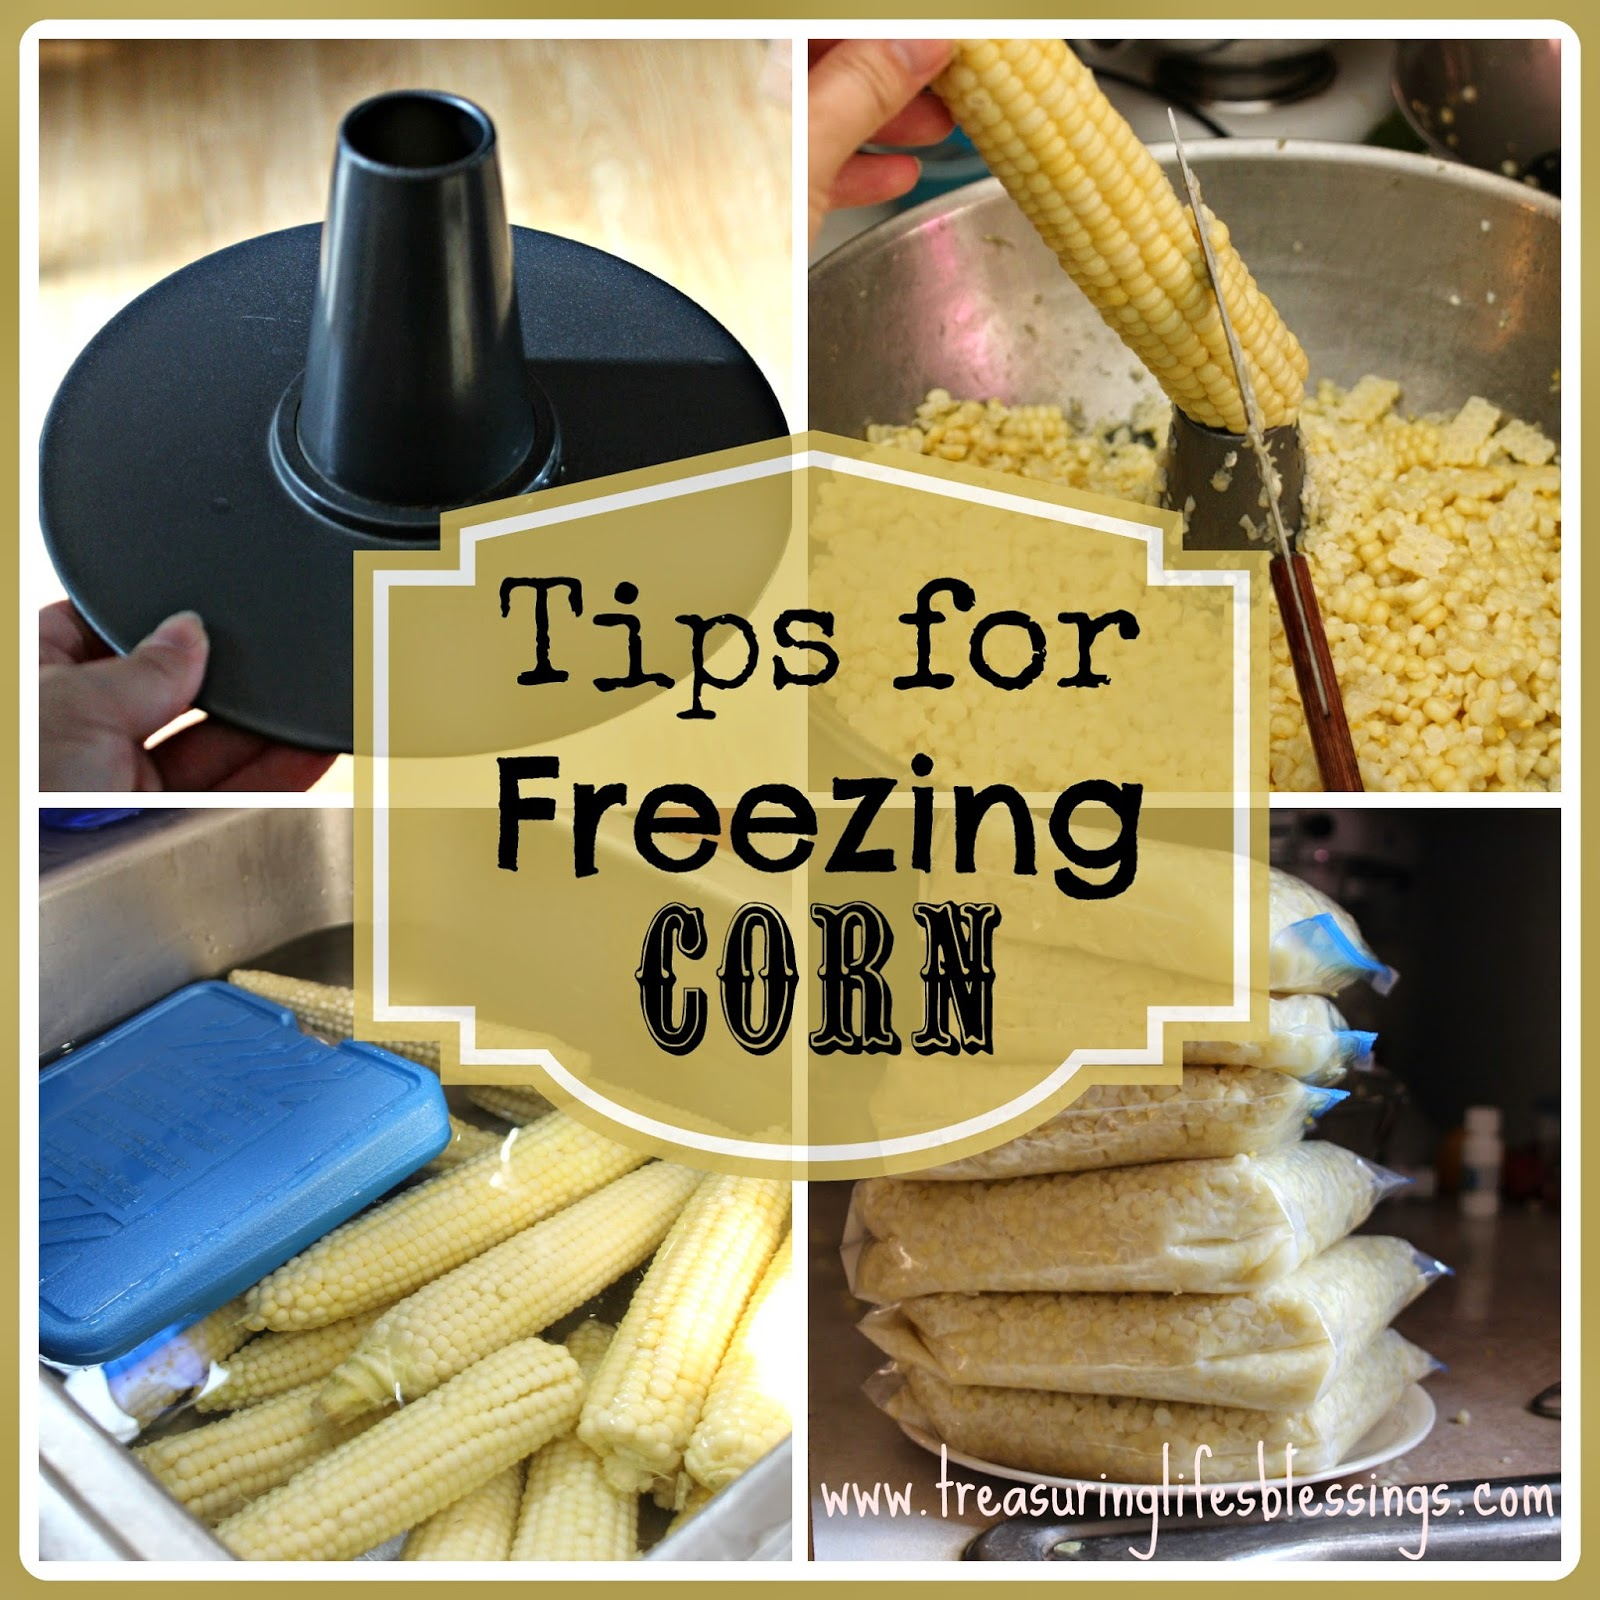 Tips For Freezing Corn